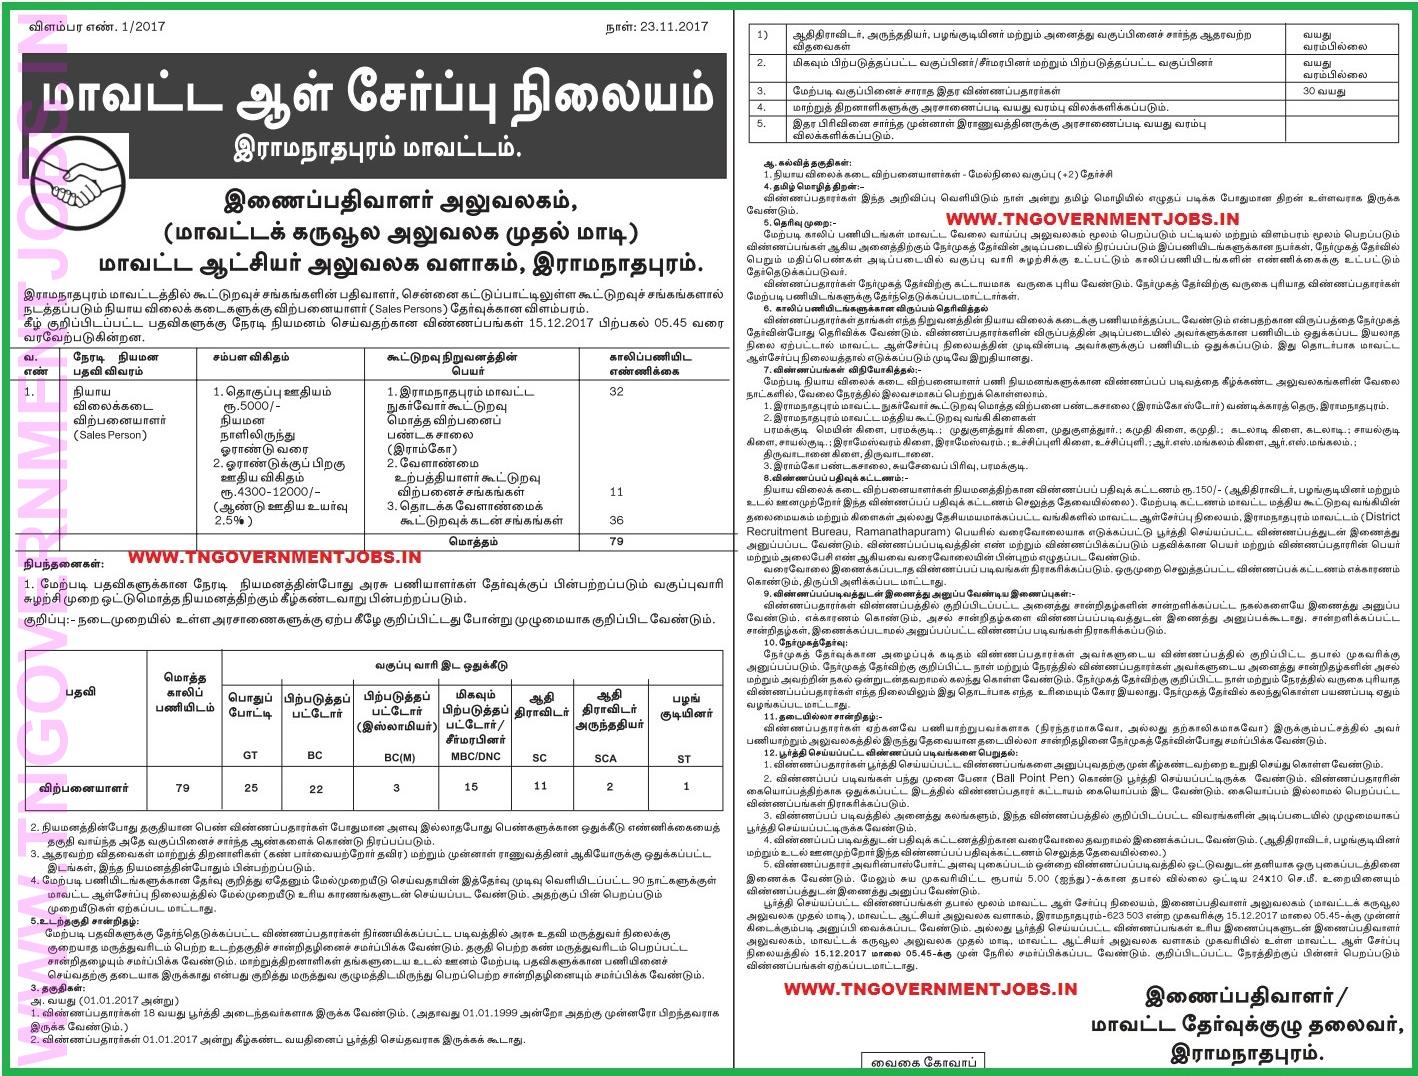 ramanathapuram-ration-shop-sales-man-recruitment-notification-2017-www-tngovernmentjobs-in